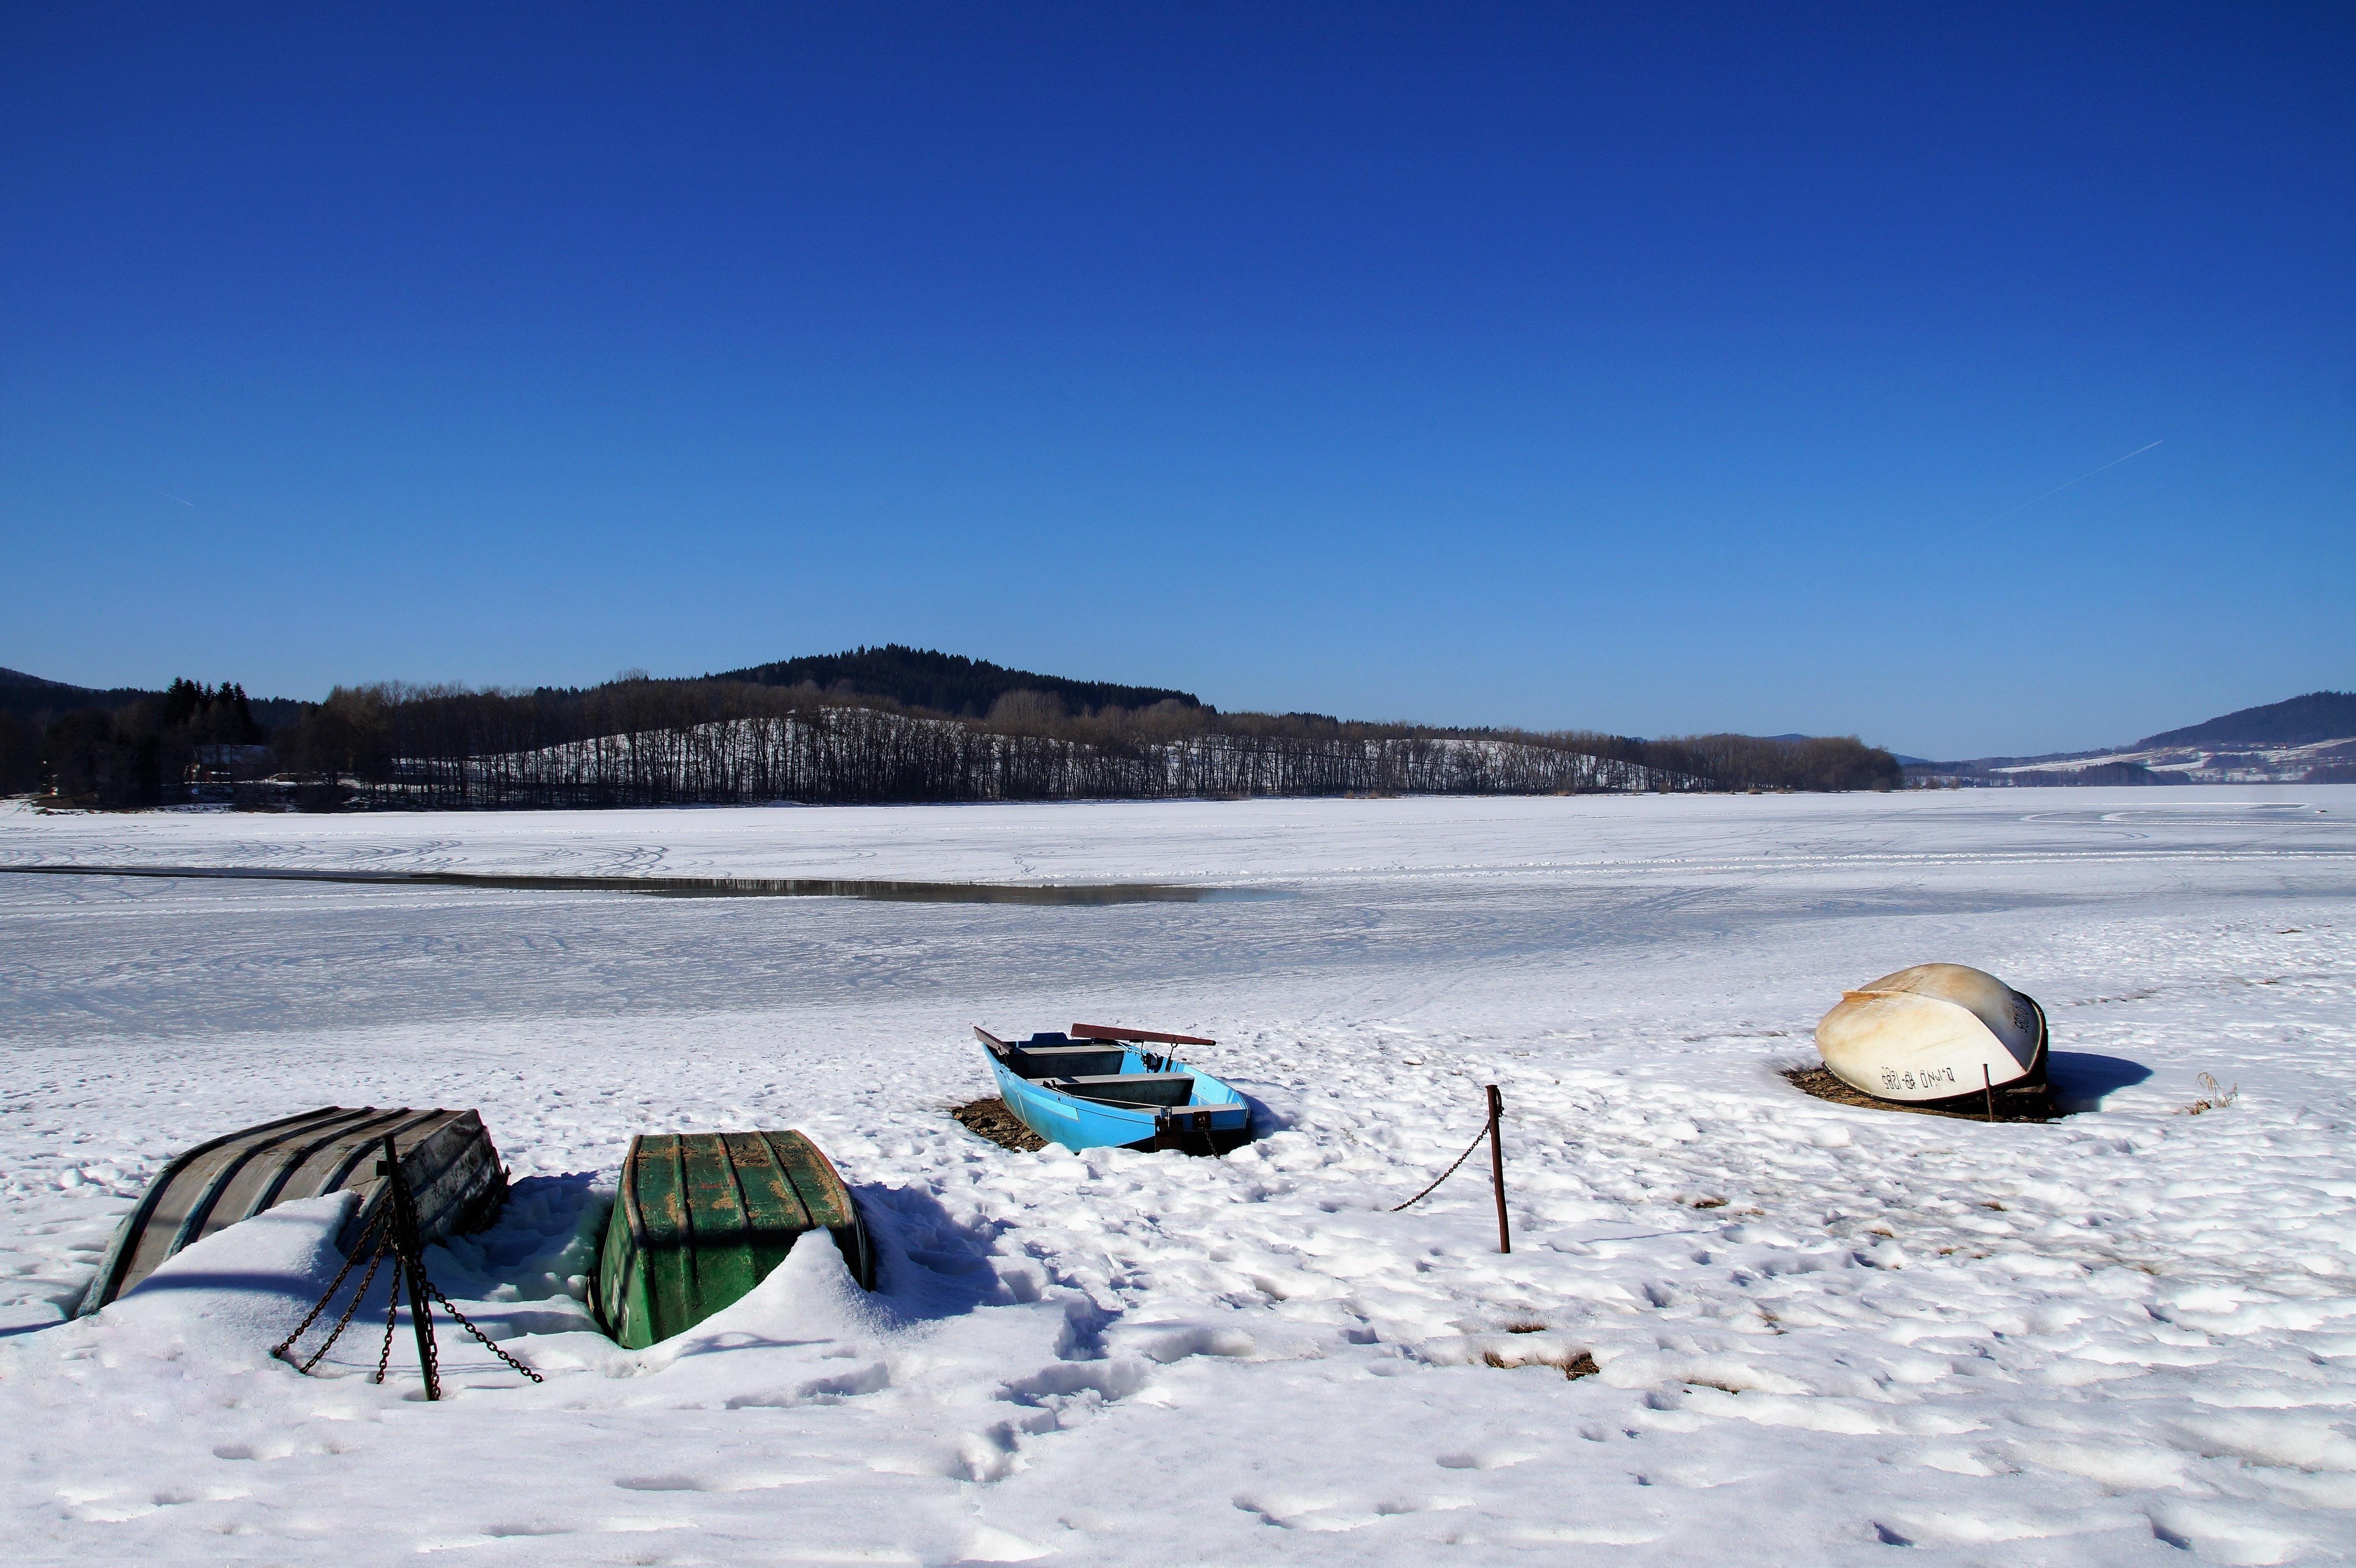 snow winter seasons sea - photo #17